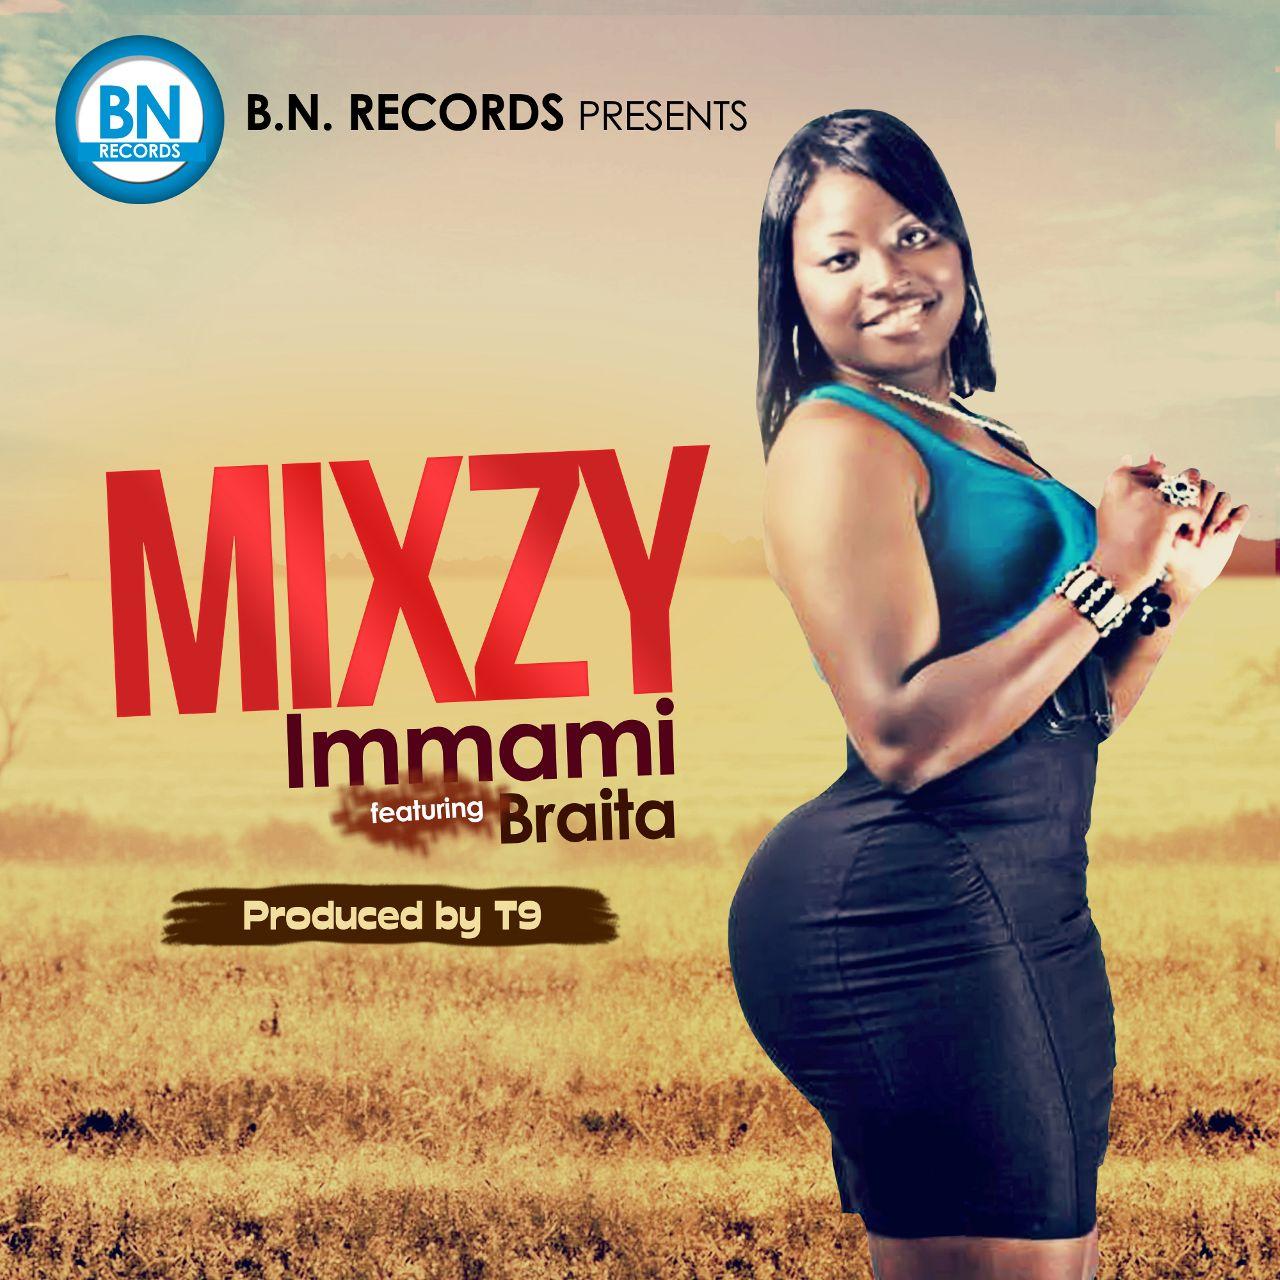 MIXZY_ART_IMMANI Audio Music Recent Posts